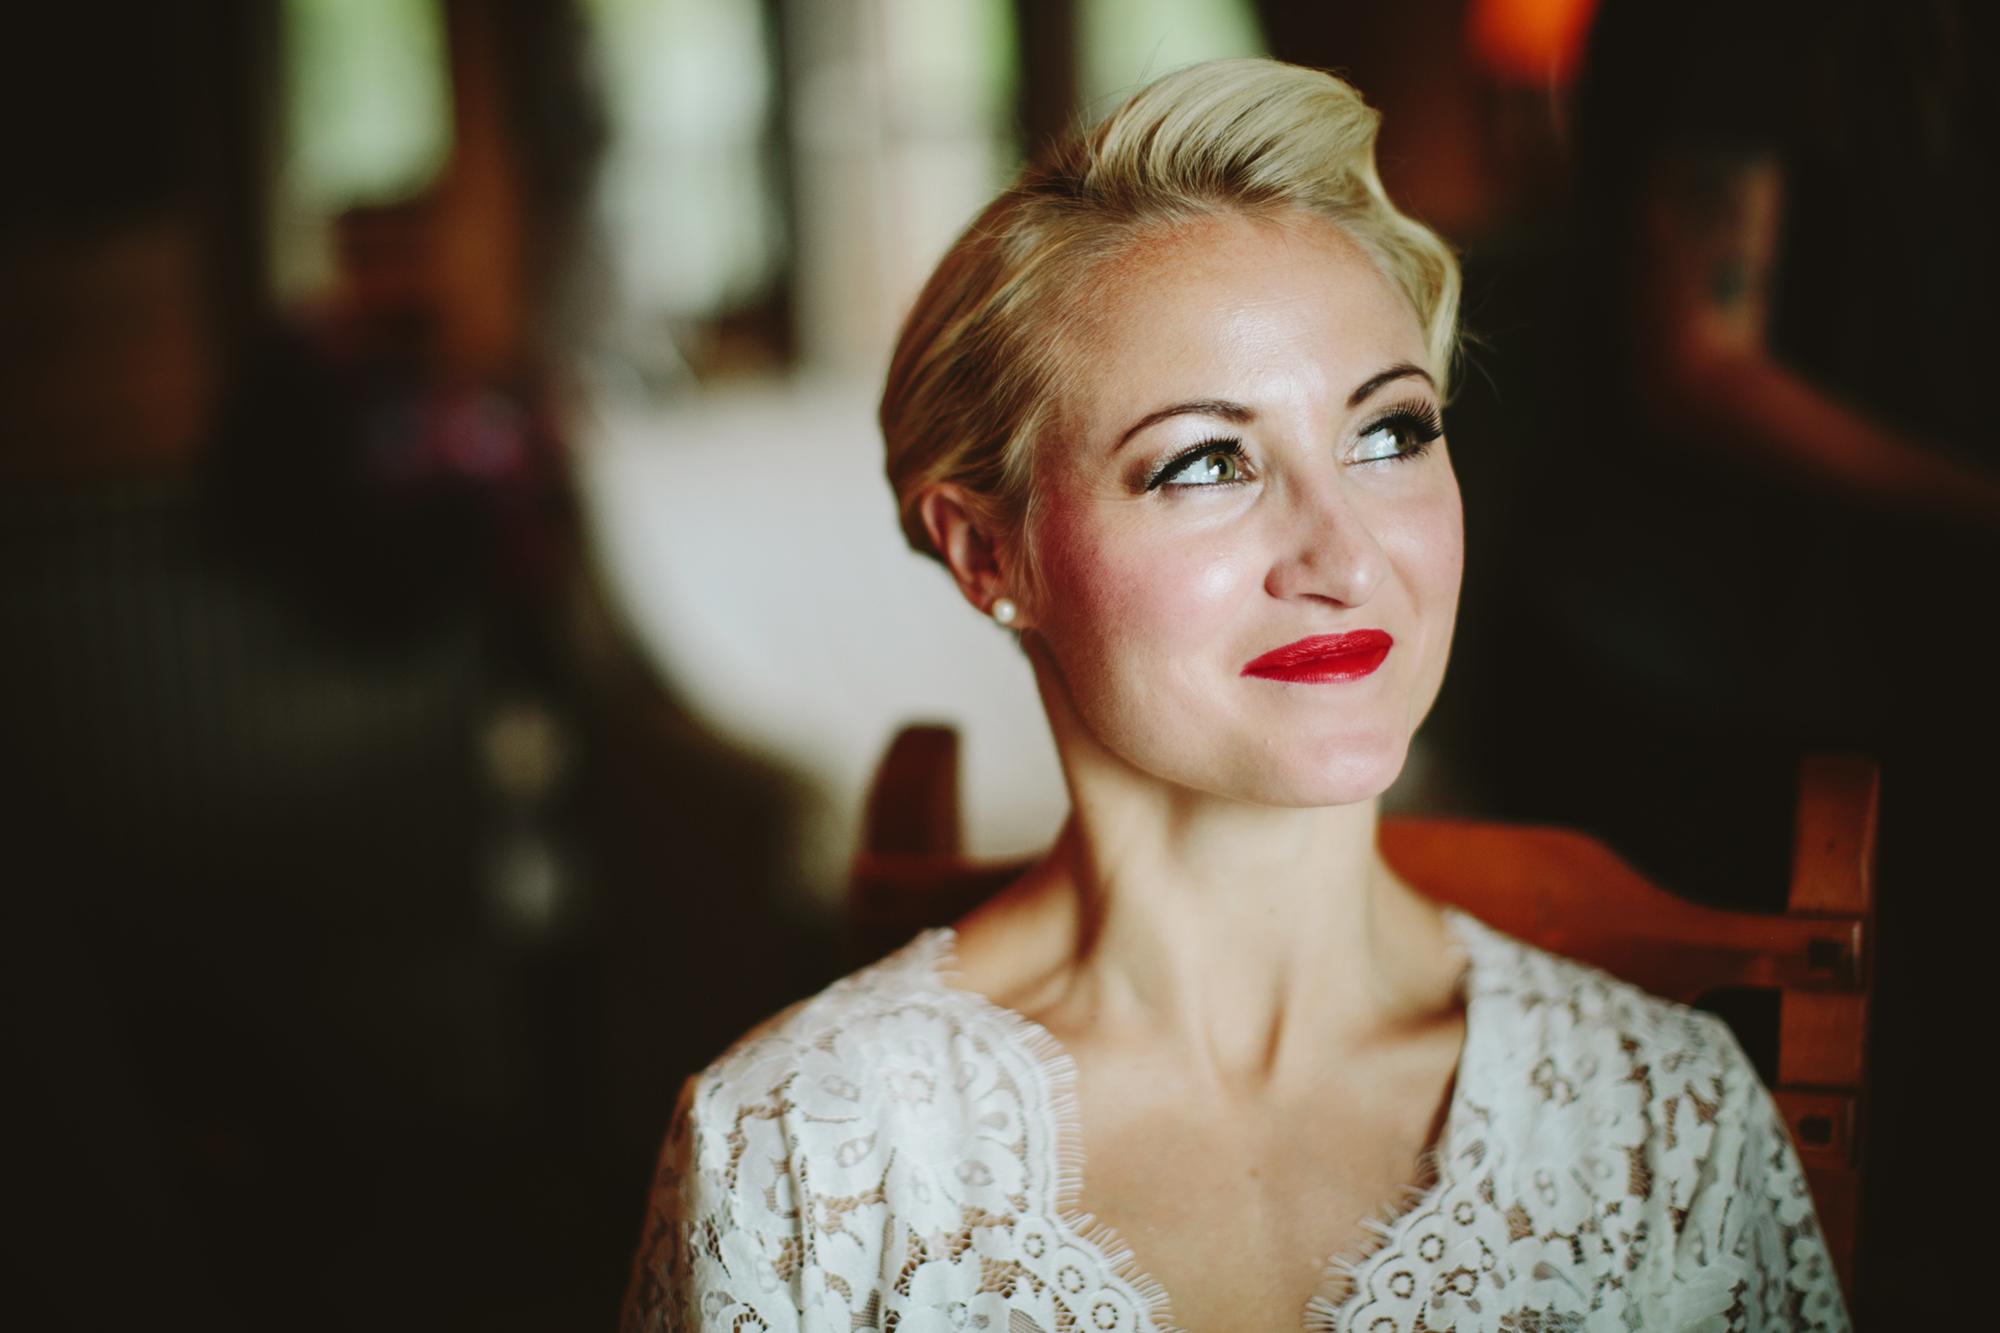 mountain wedding, lake wedding, alberta wedding photographer, bride getting ready, 30s hairstyle